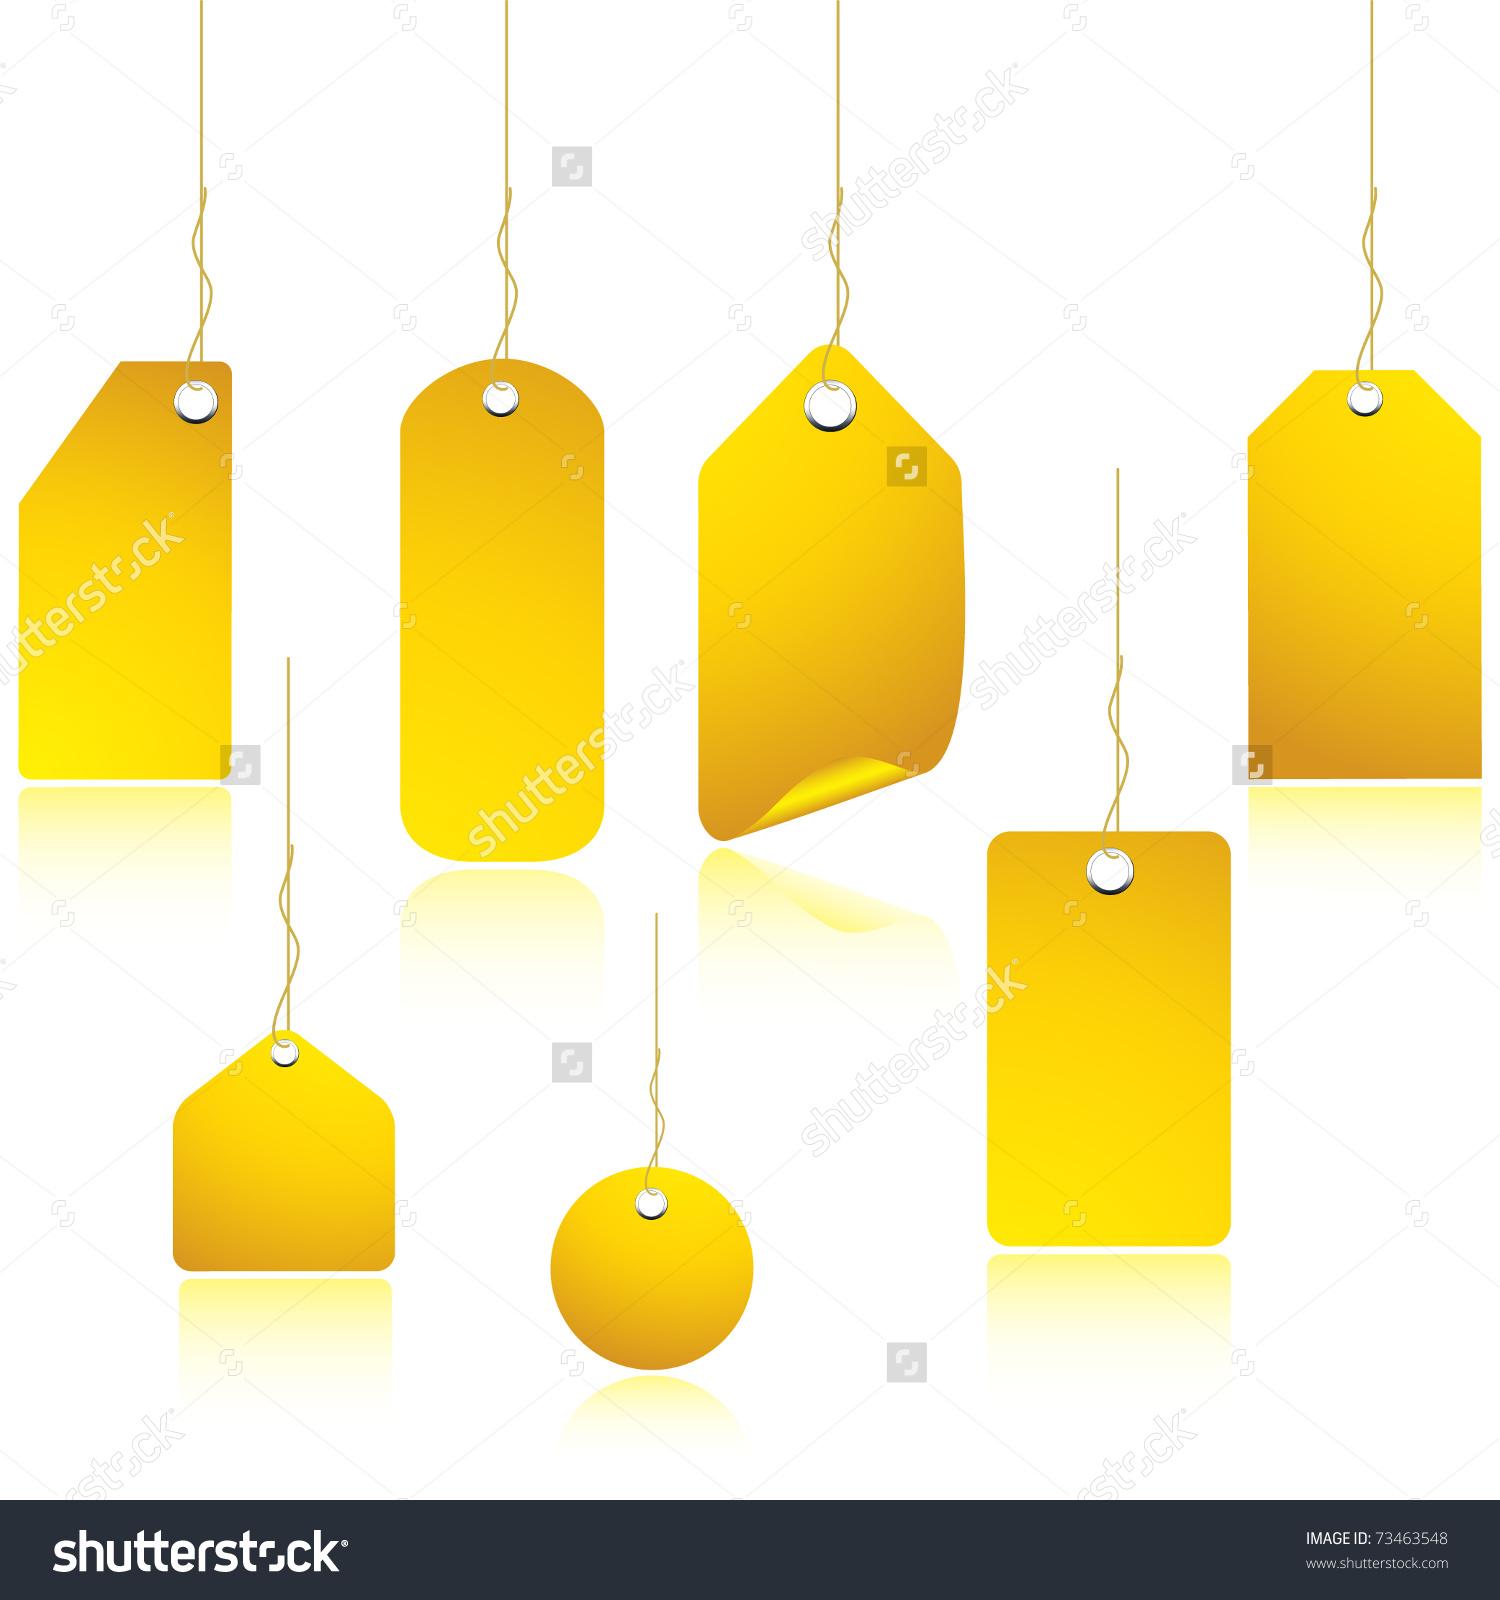 Gold . Burst clipart price tag